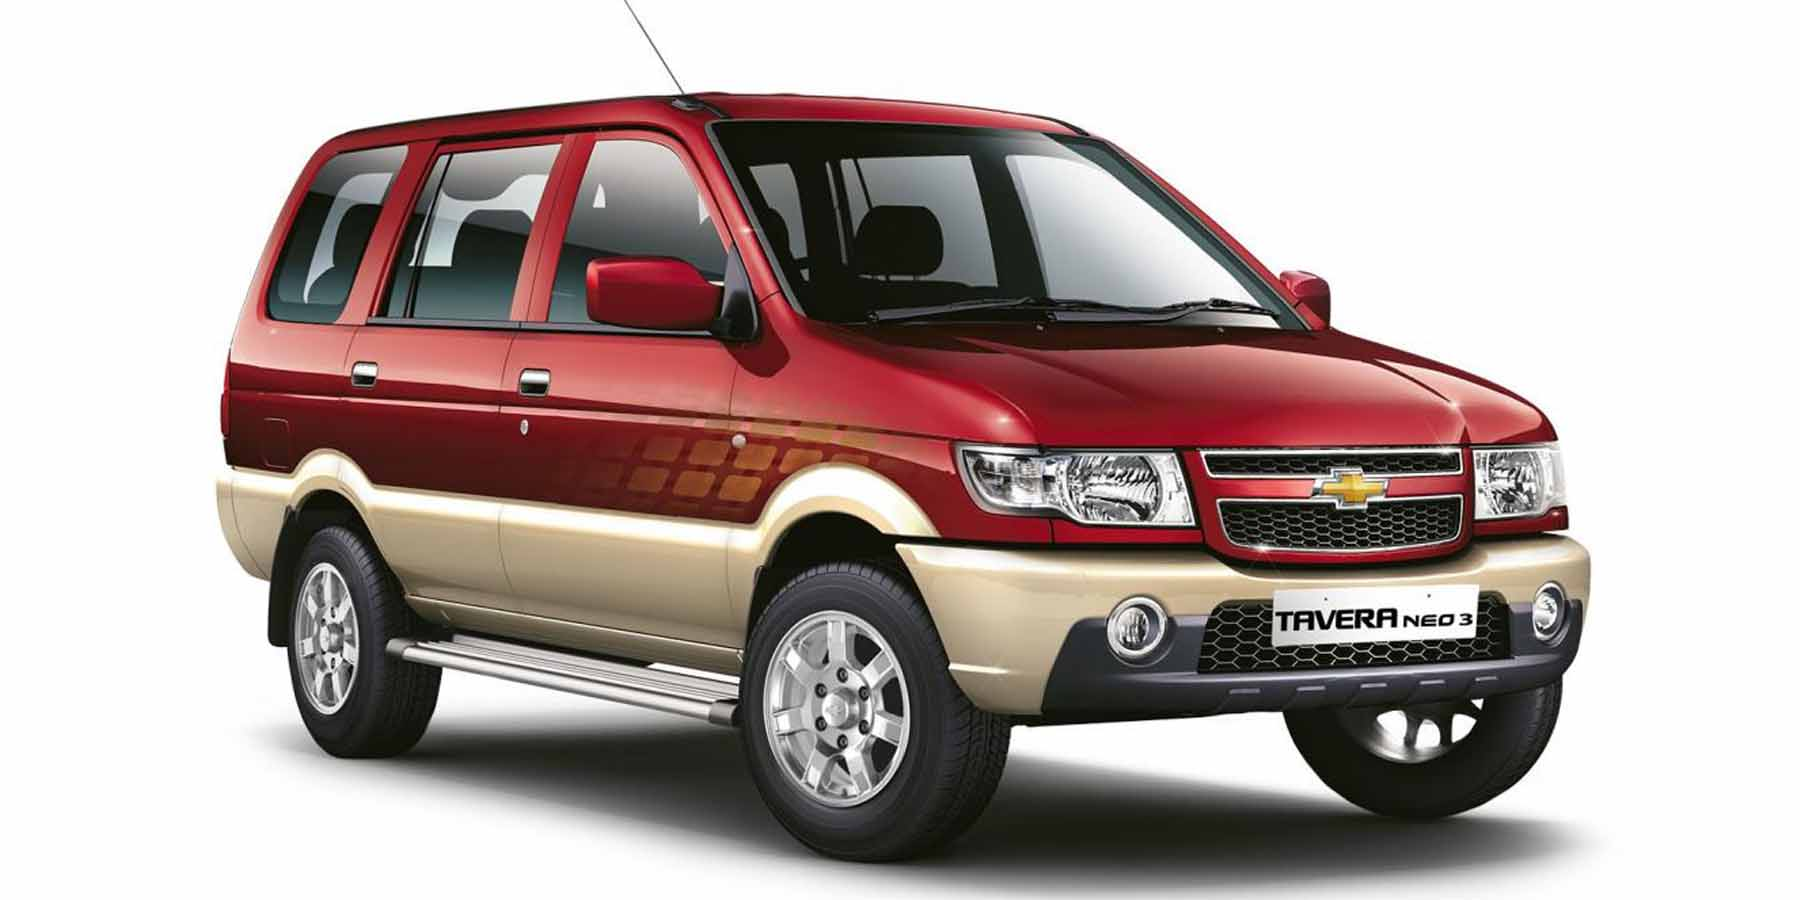 Hire Taxi - Local Jaipur Tour